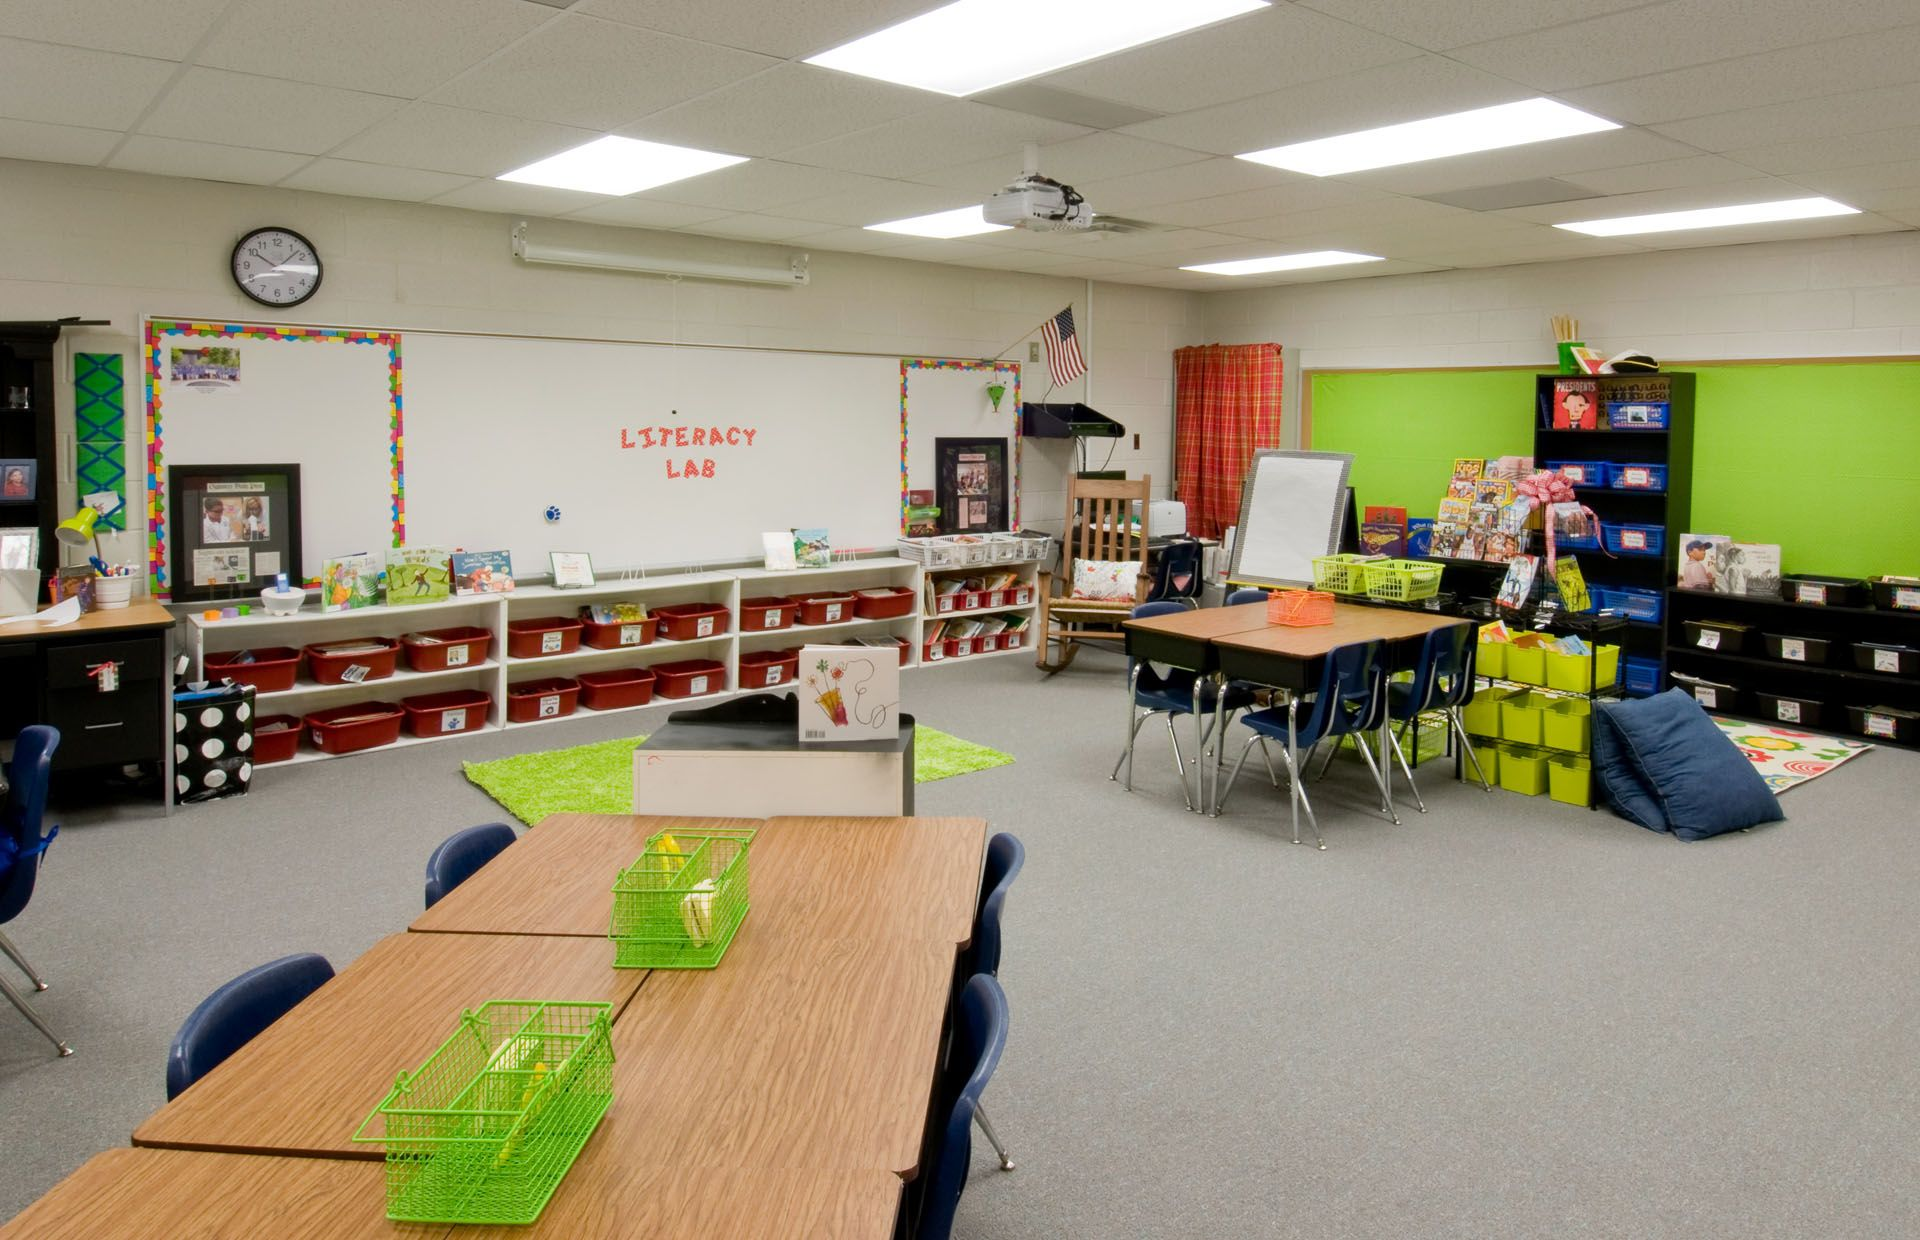 Classroom Layout Ideas Elementary ~ Elementary school classroom burnette